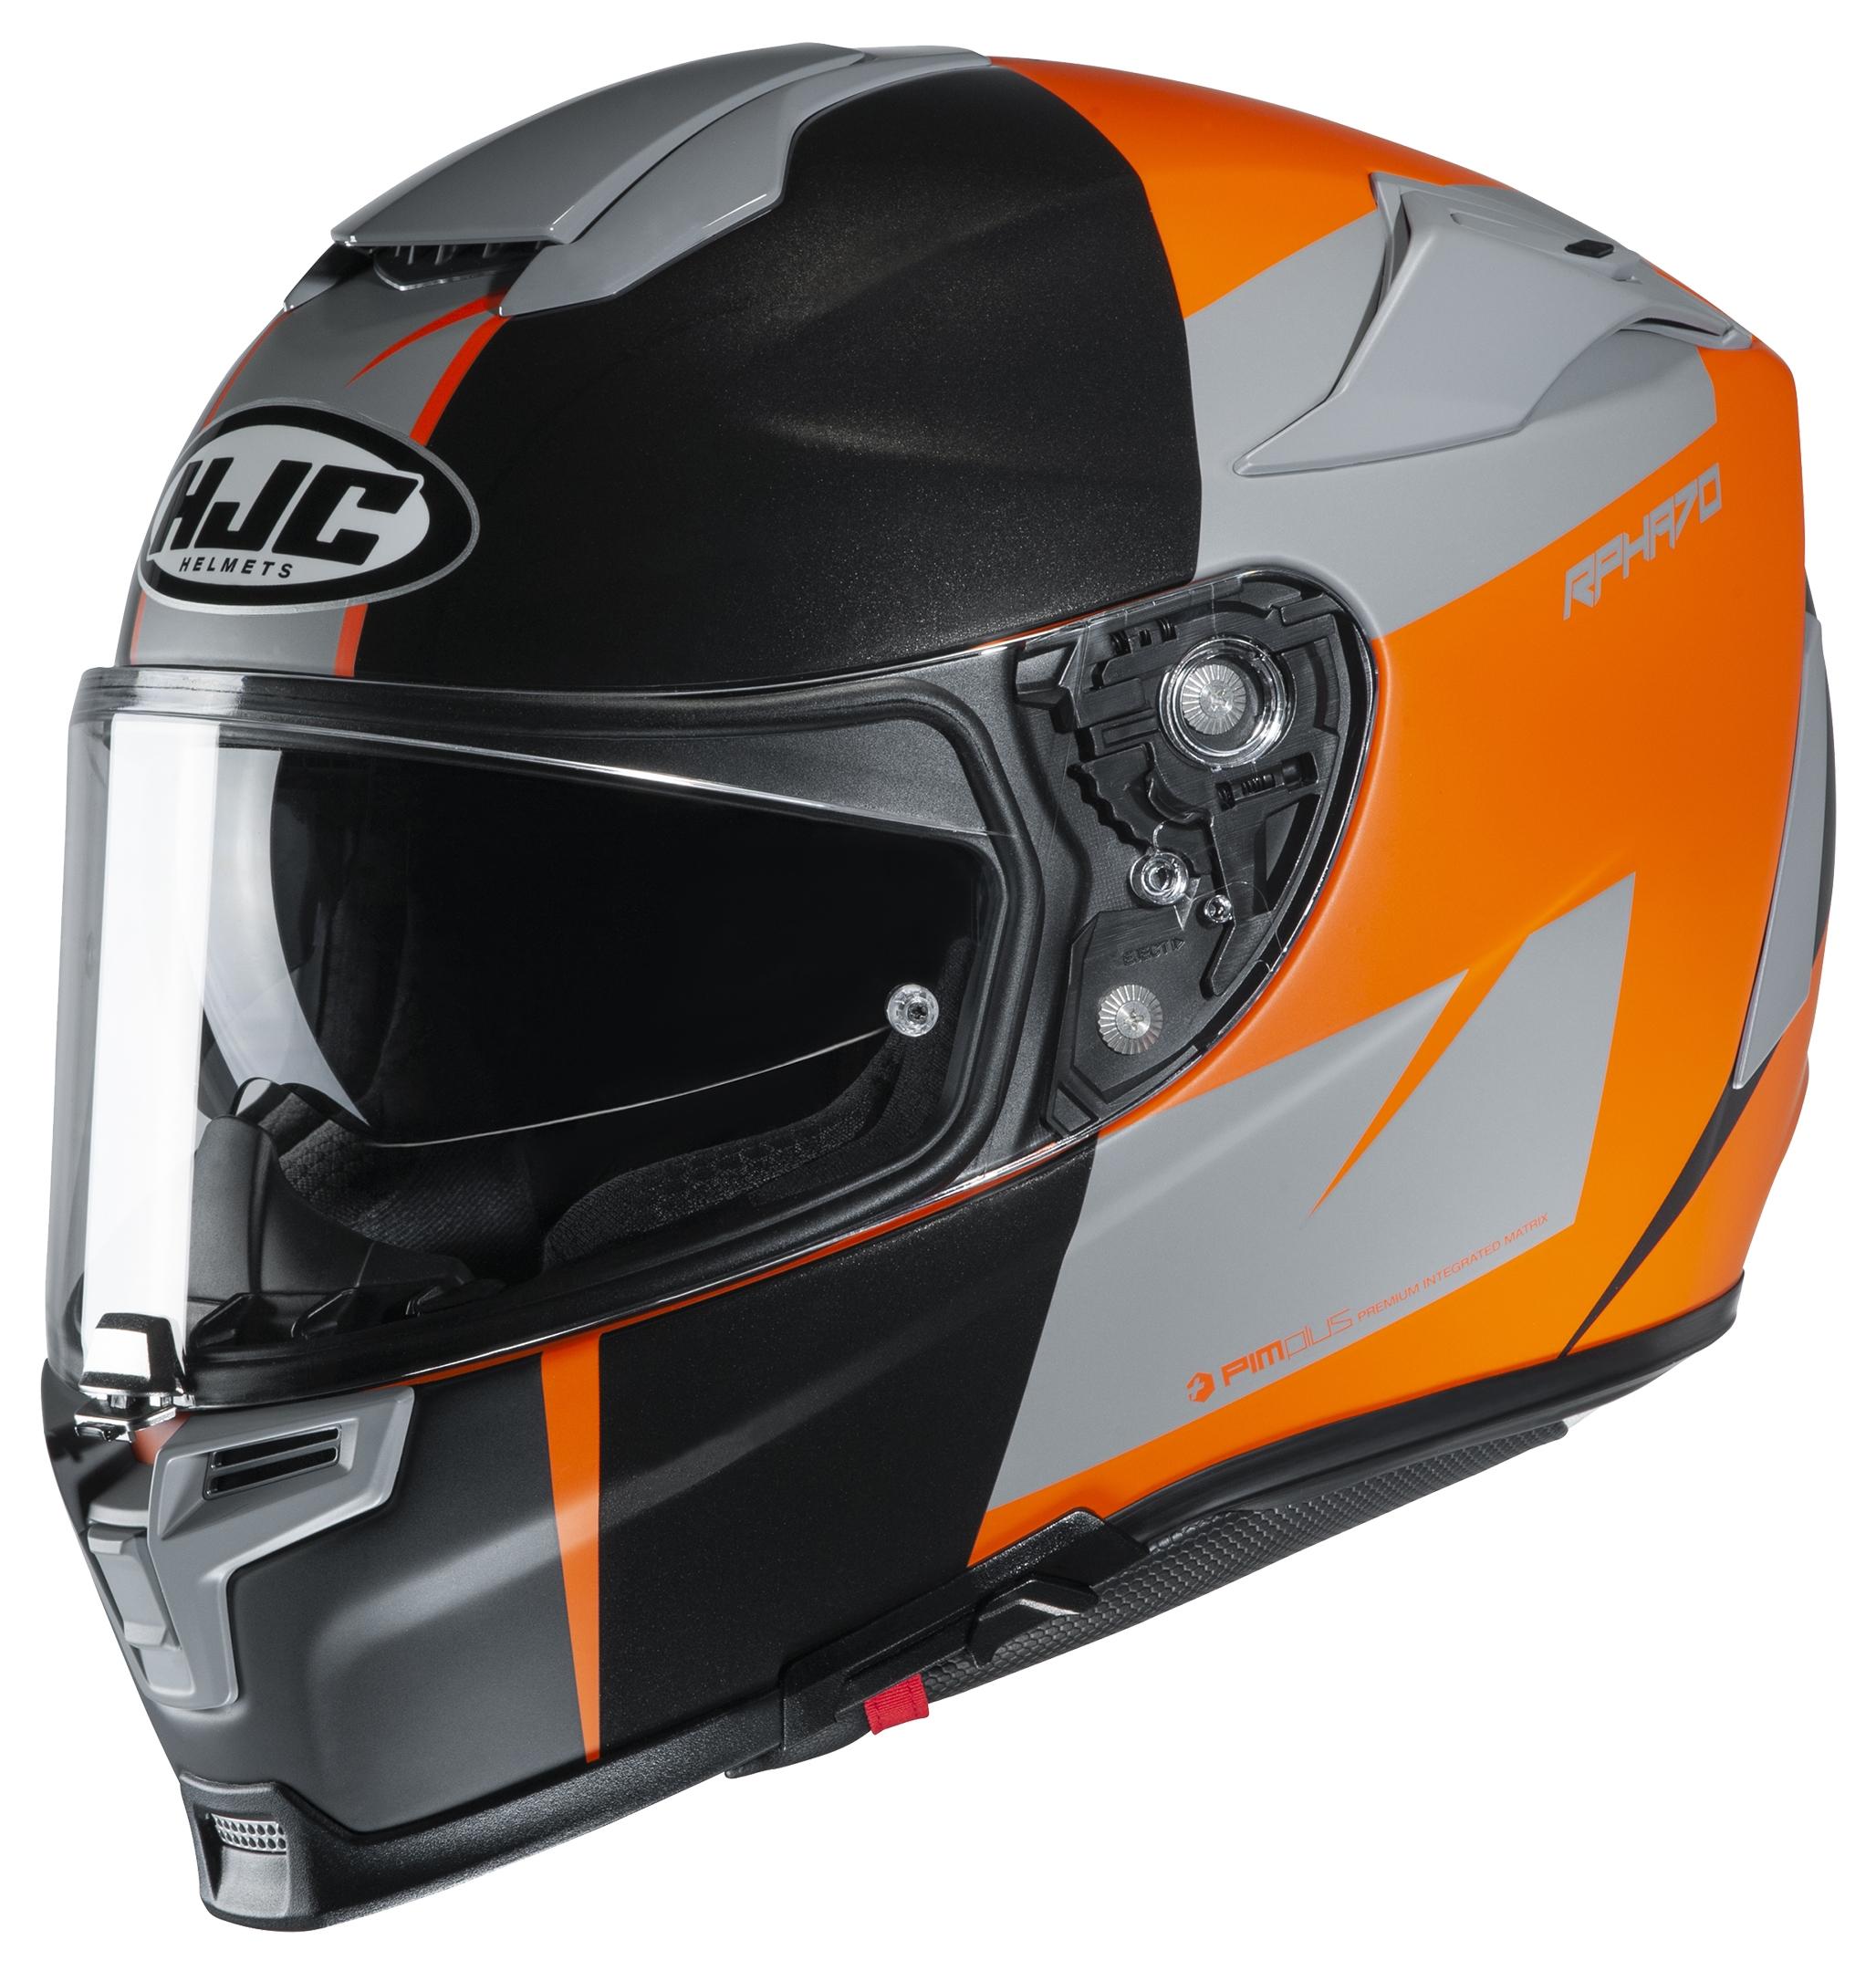 SNOWMOBILE BIKE REFLECTIVE HELMET DECALS 26 PIECE SAFETY KIT MOTORCYCLE